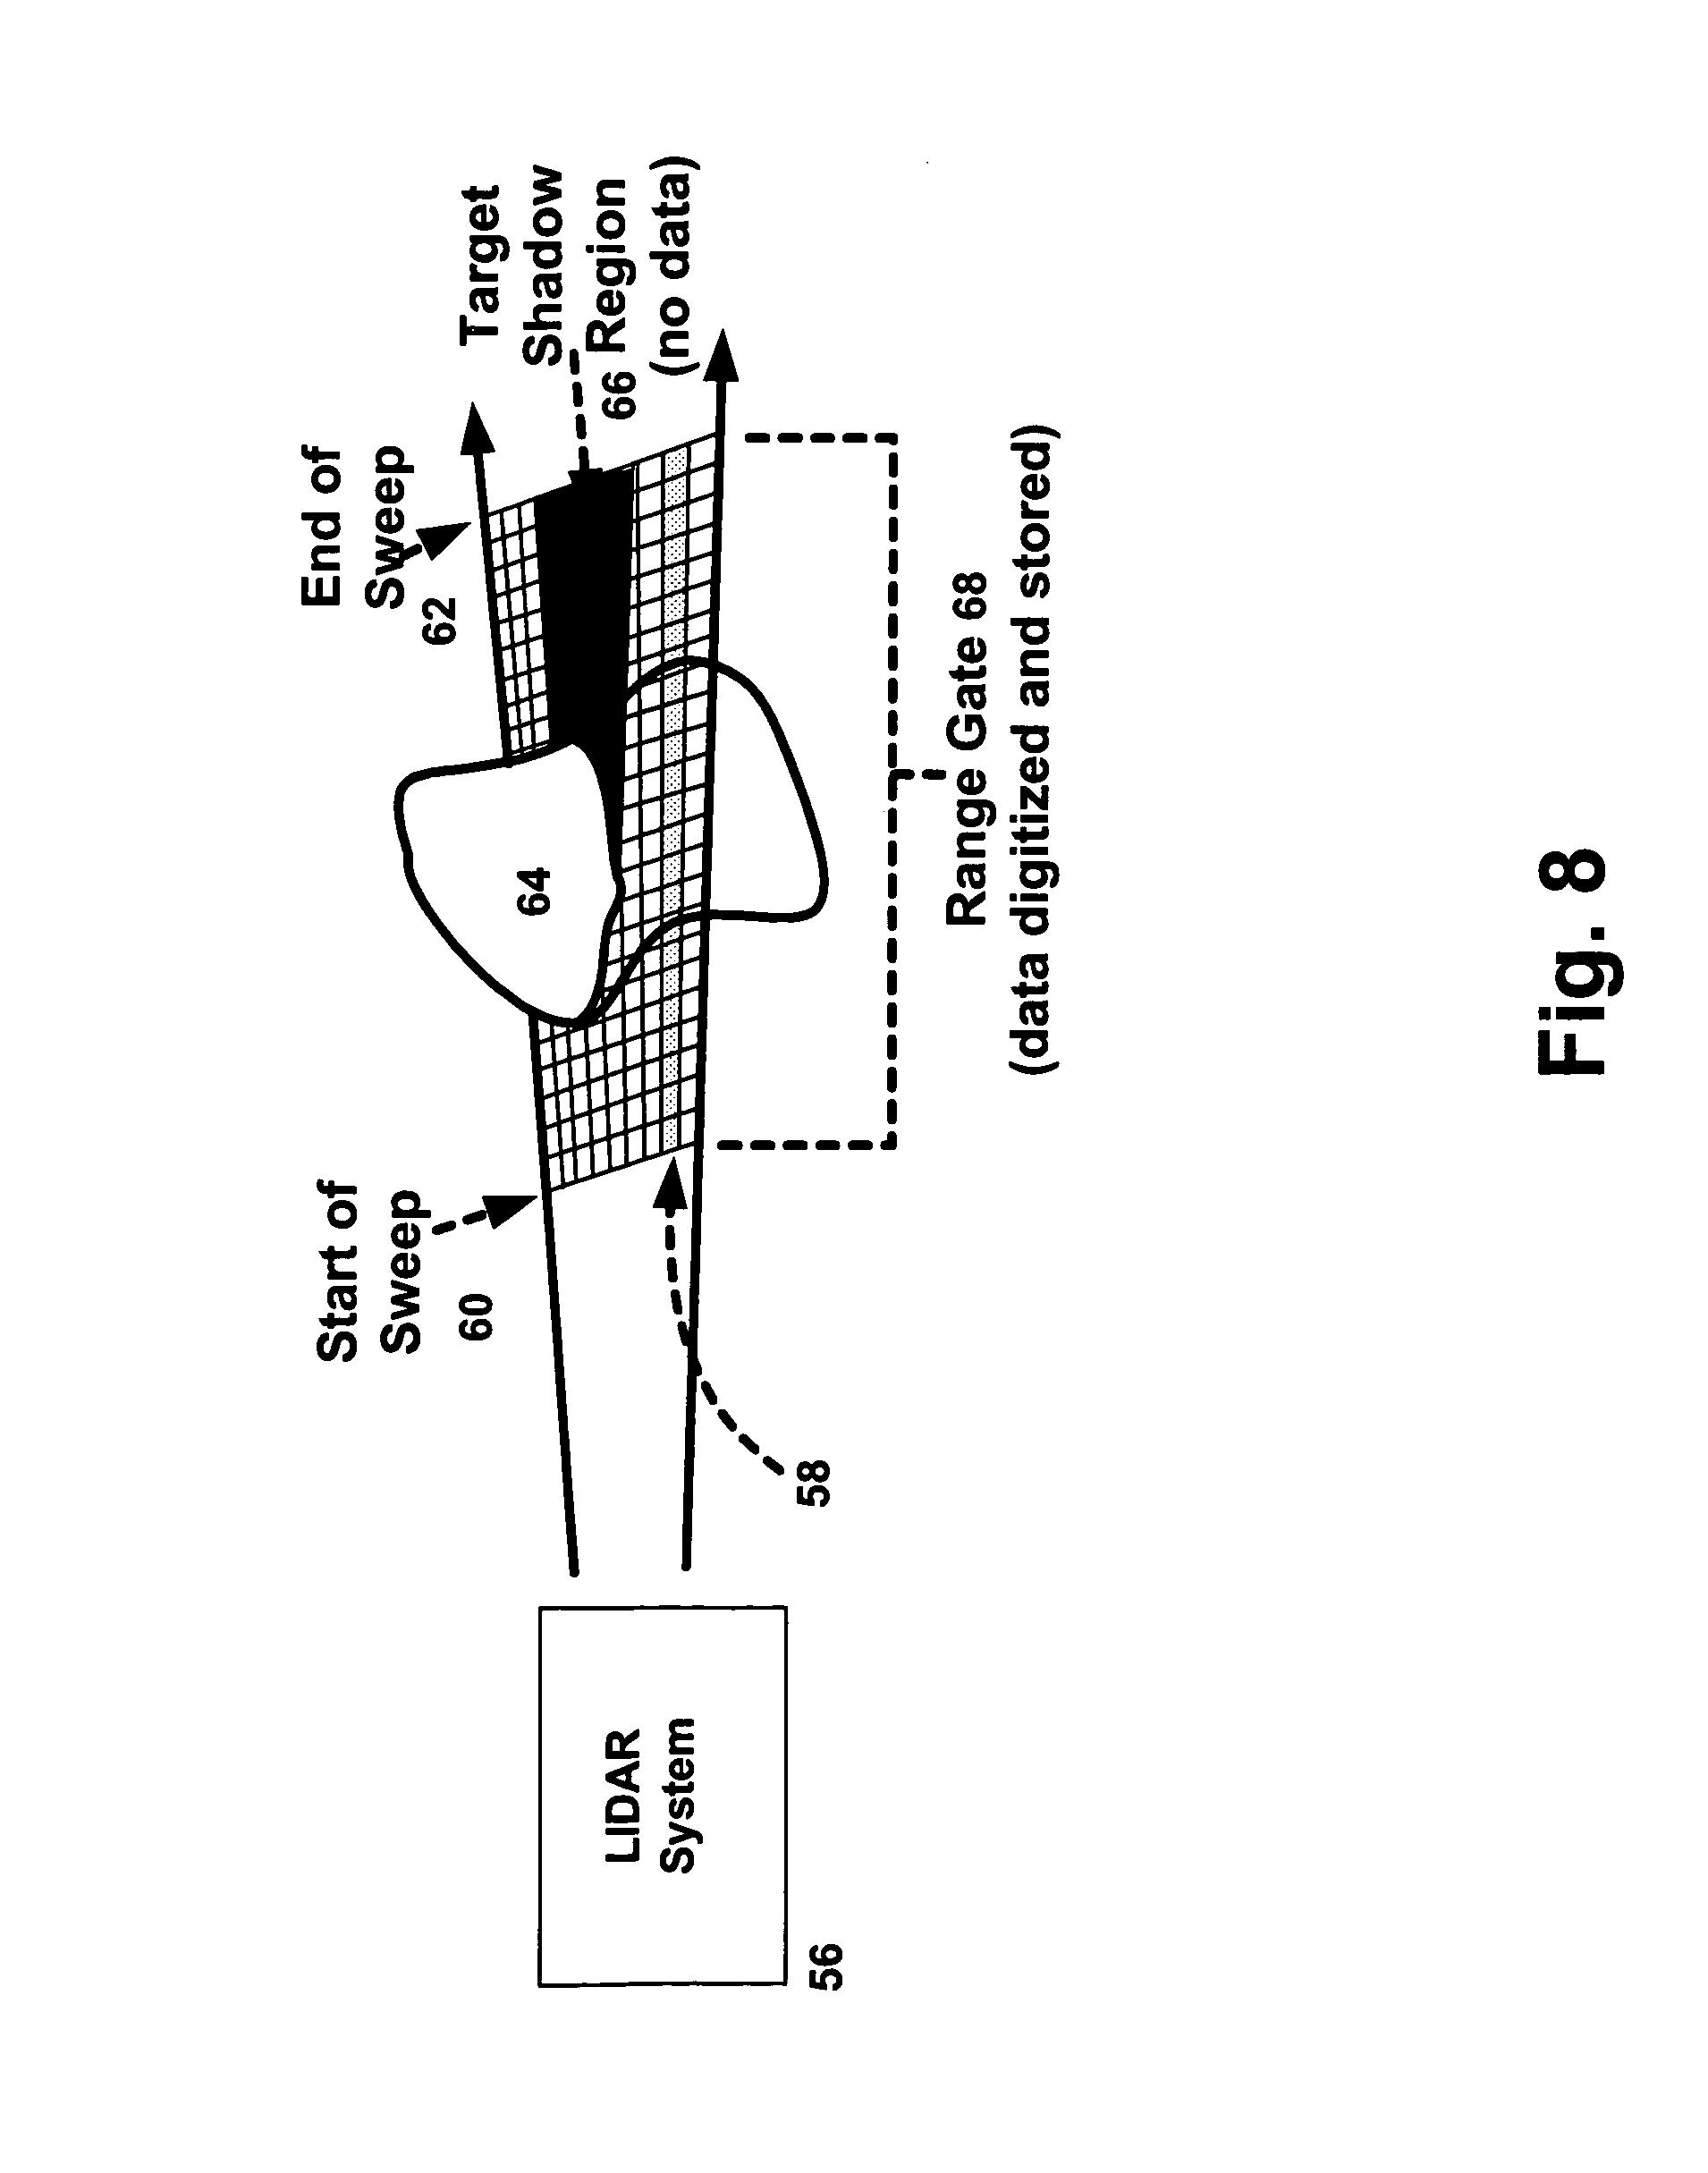 Patent US7830442 - Compact economical lidar system - Google Patents